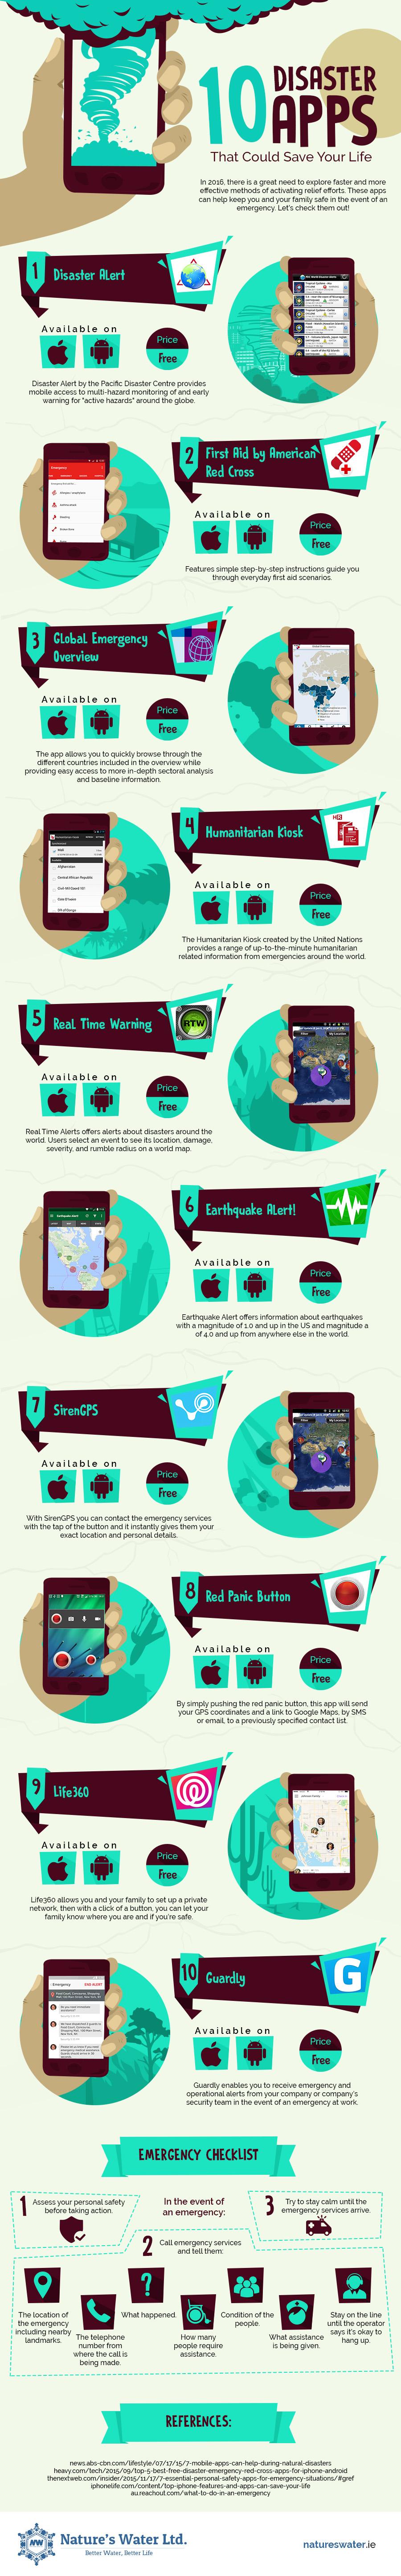 text description of infographic is below